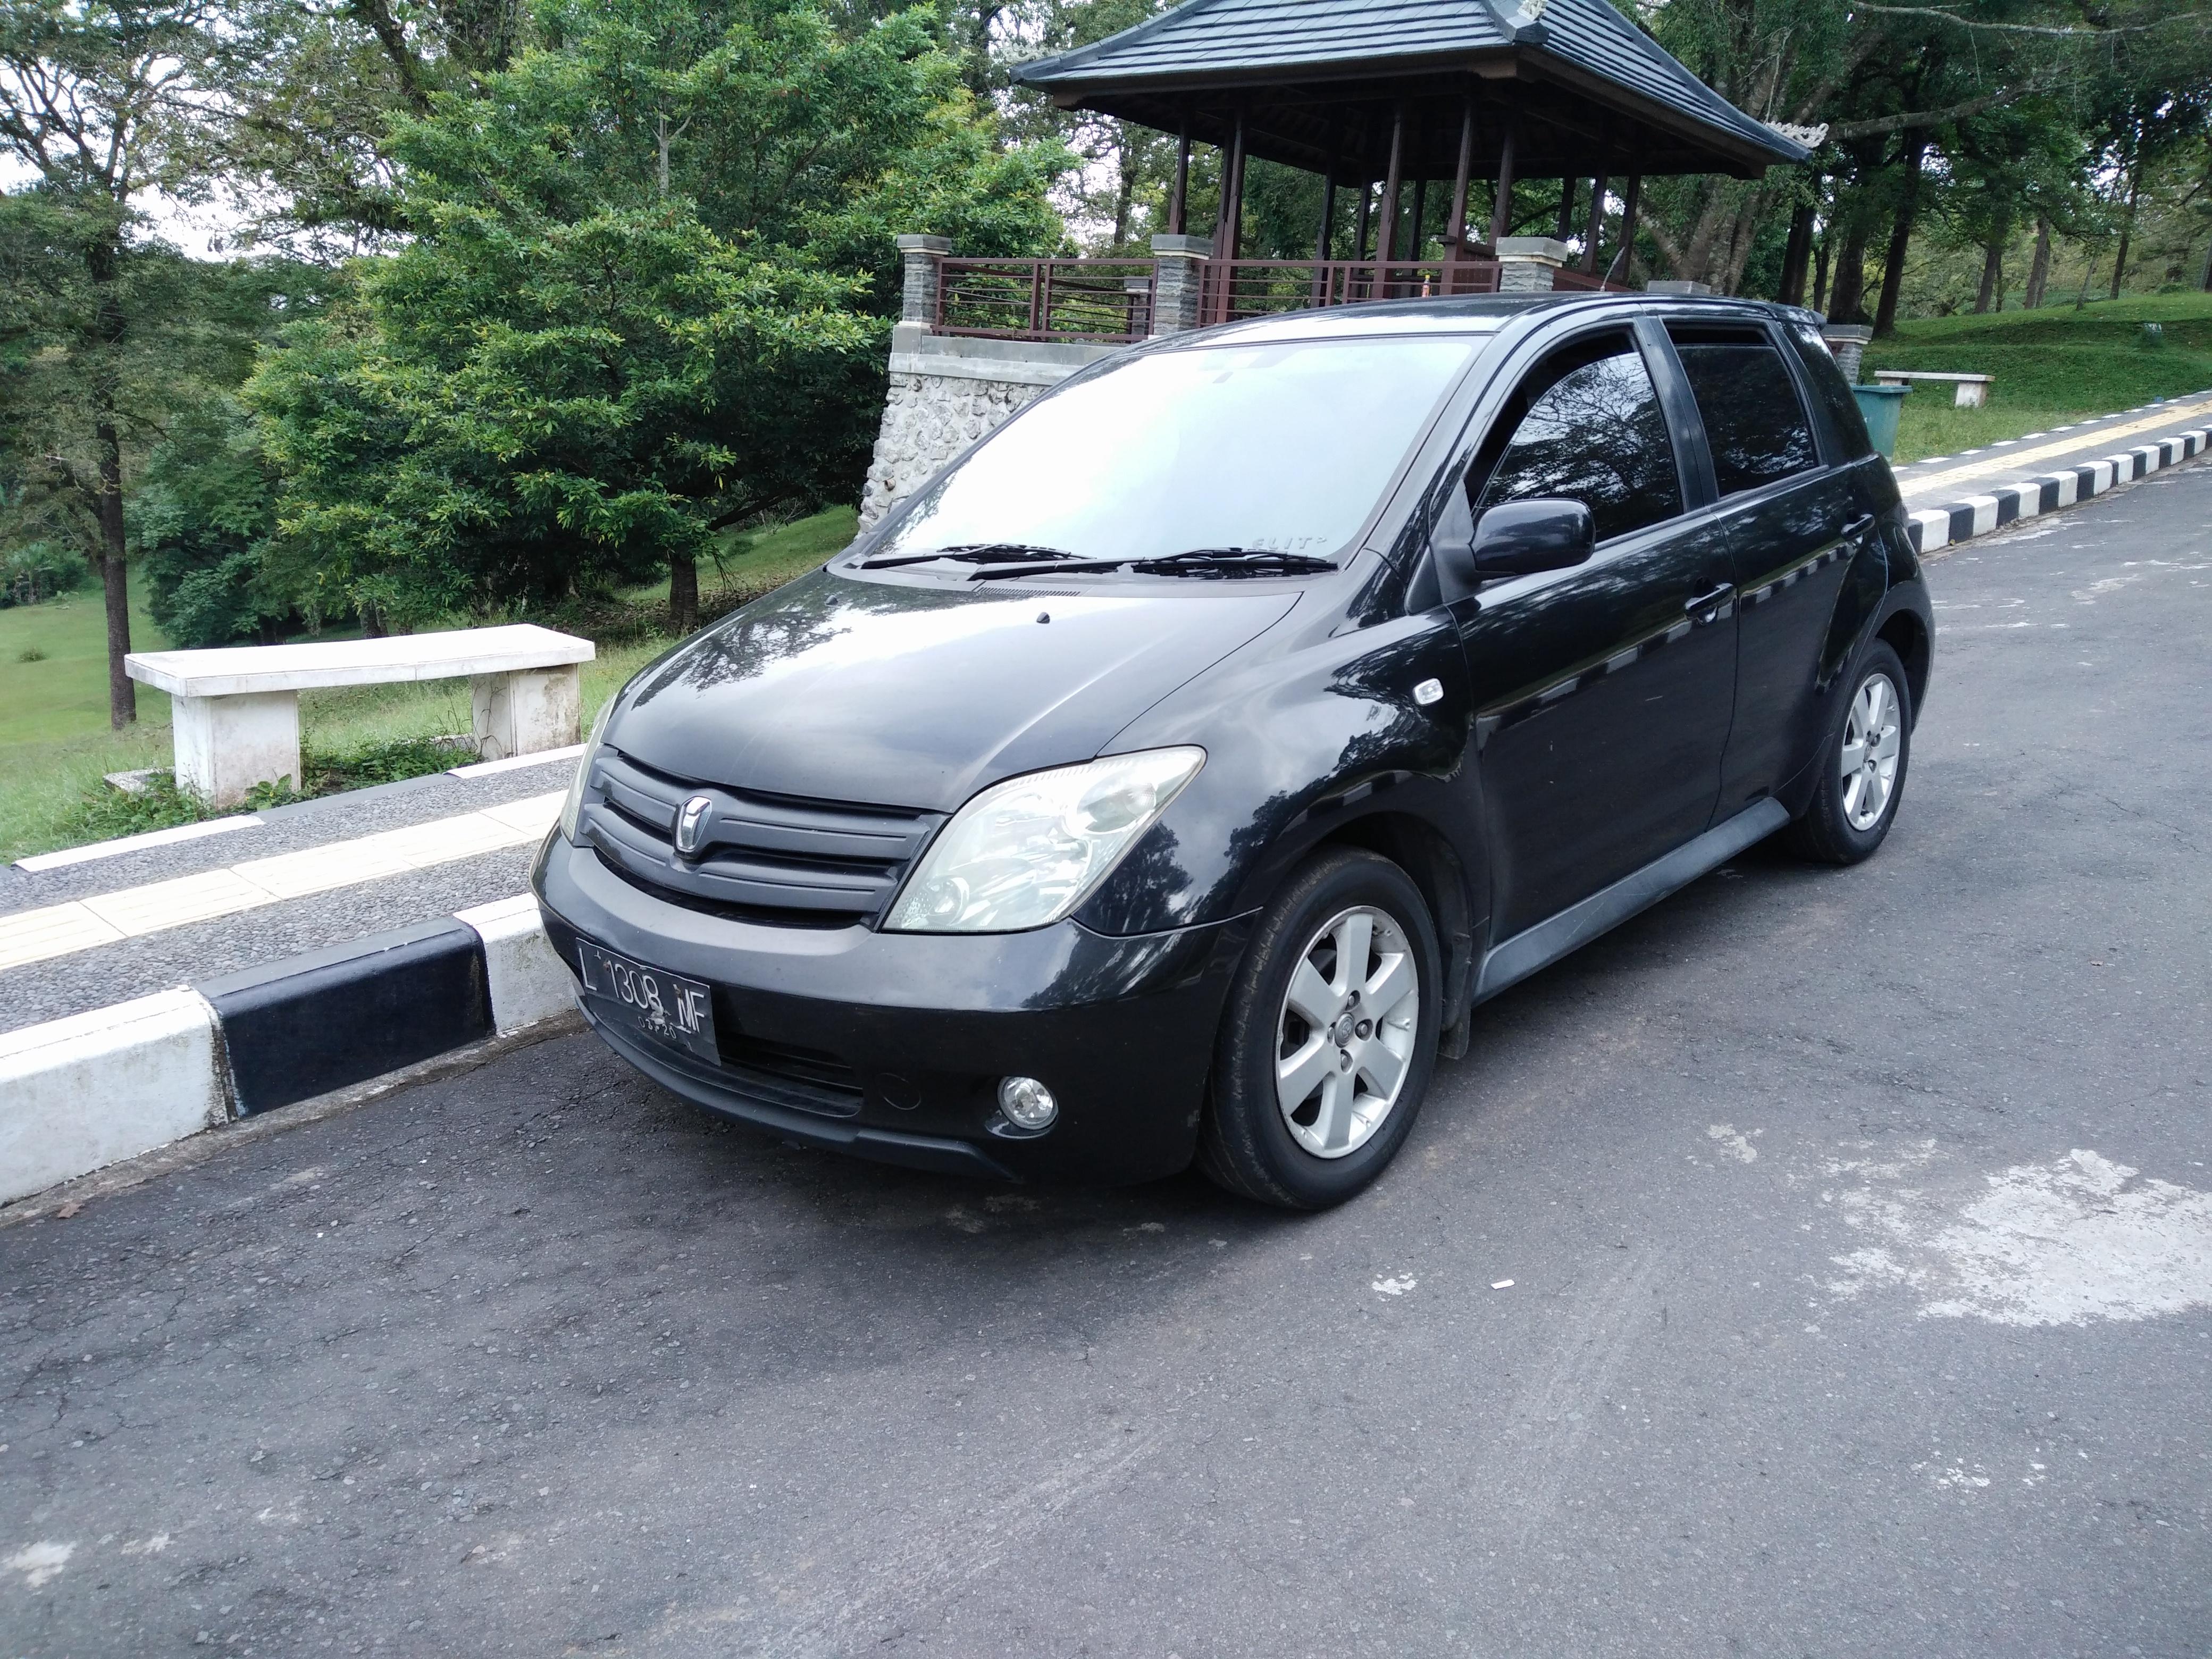 Kelebihan Toyota Ist 2005 Spesifikasi